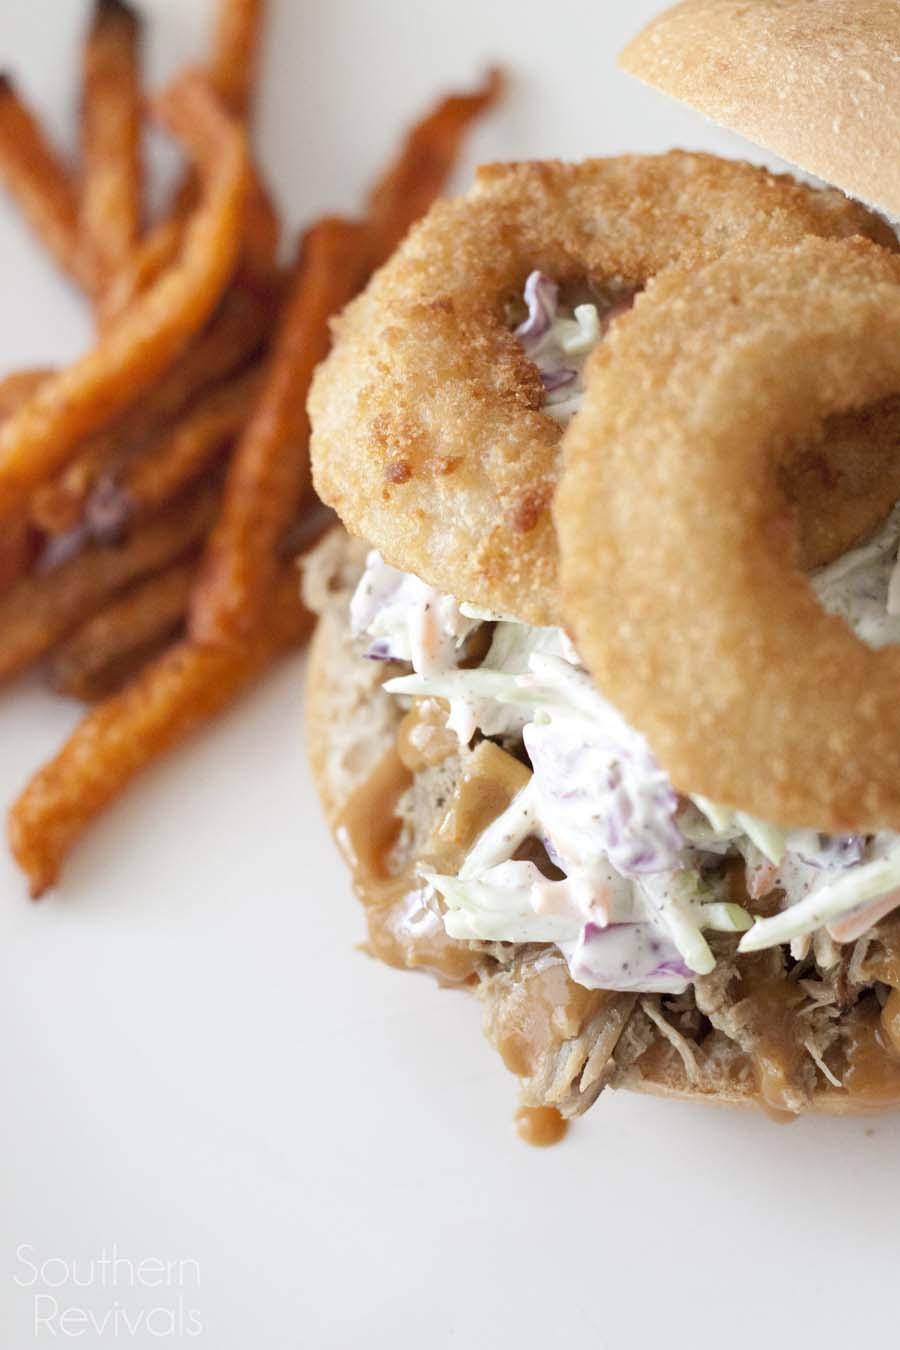 Southern BBQ Slaw Sandwich